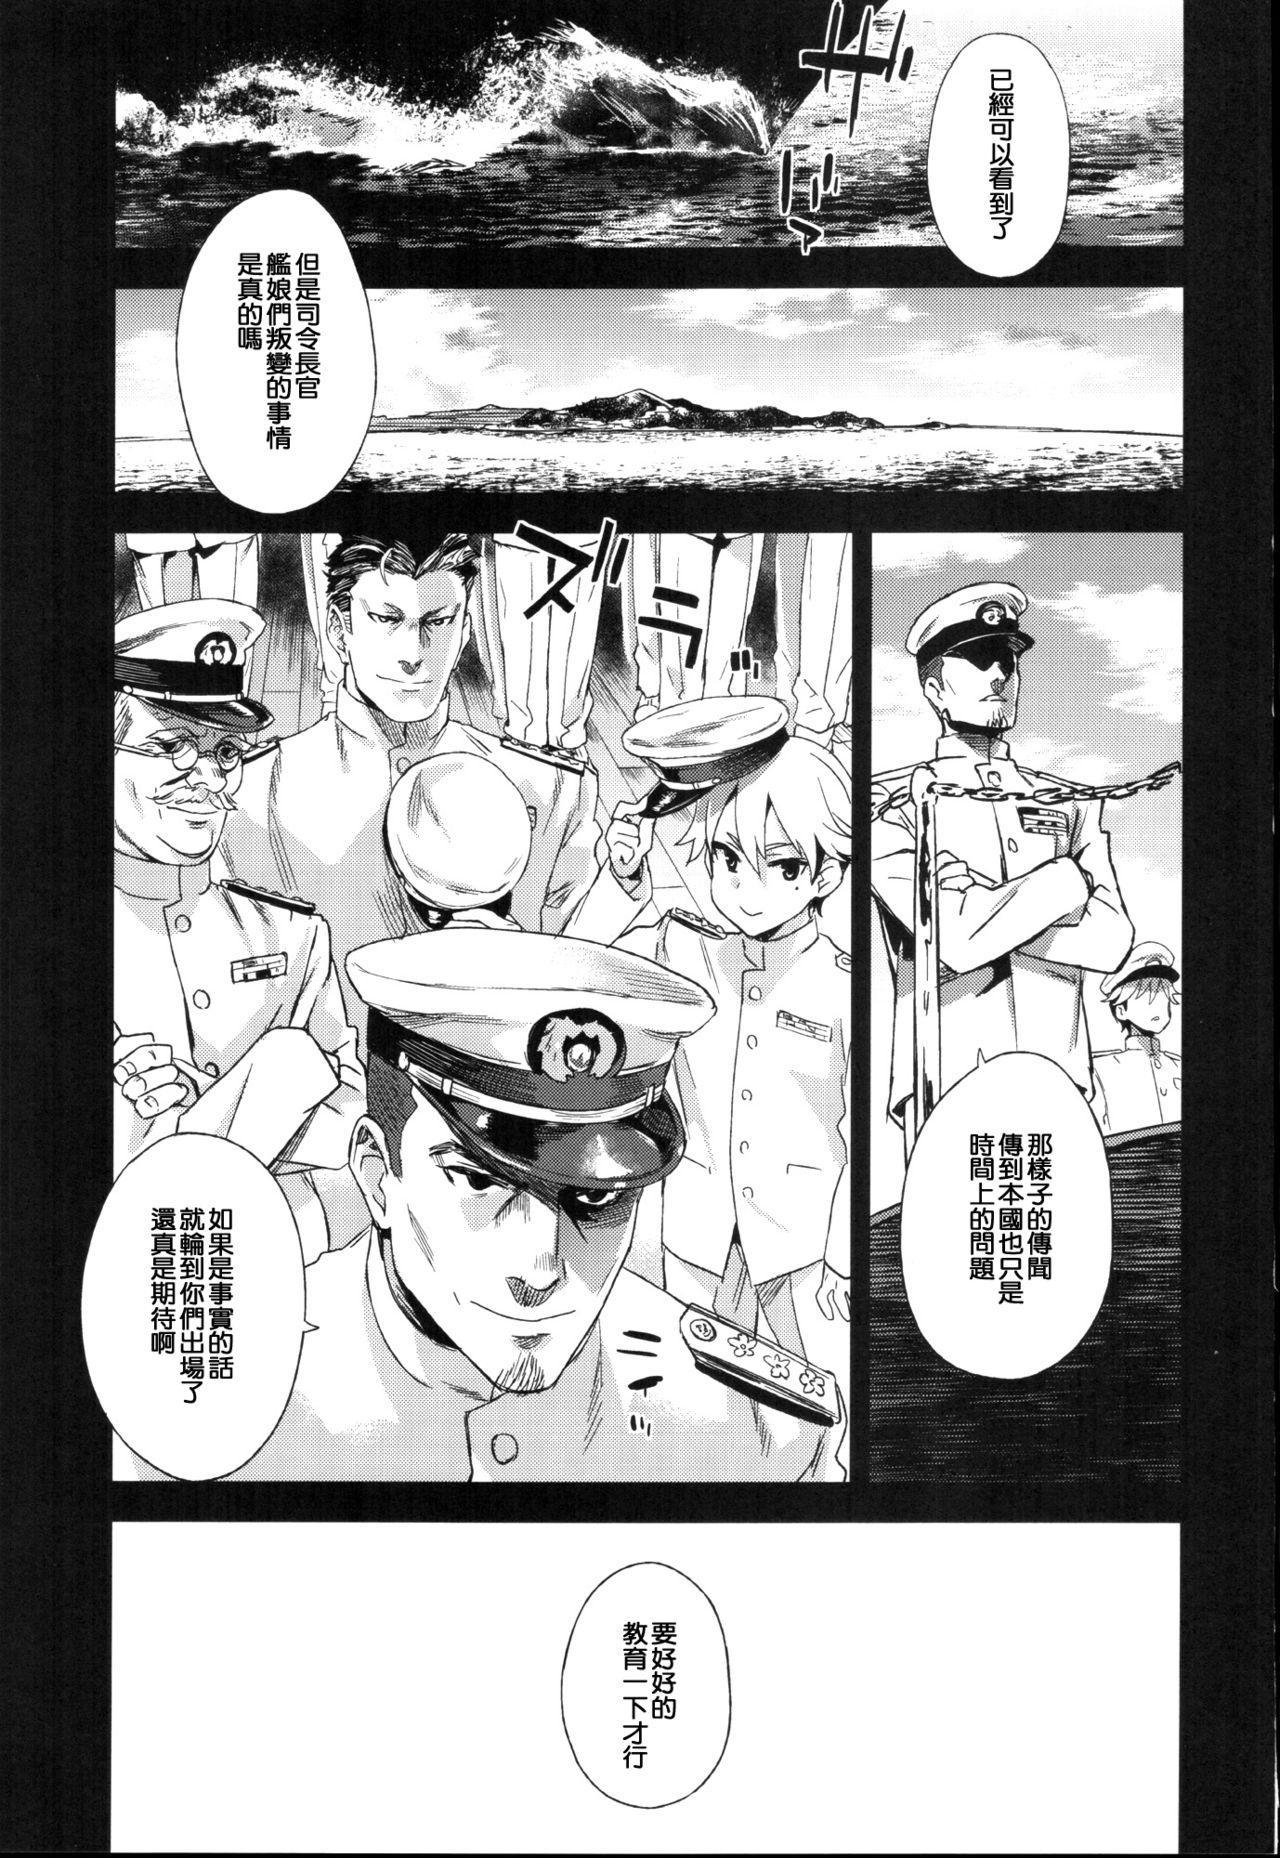 Victim Girls 22 Joou Kashima no Choukyou Nisshi 1